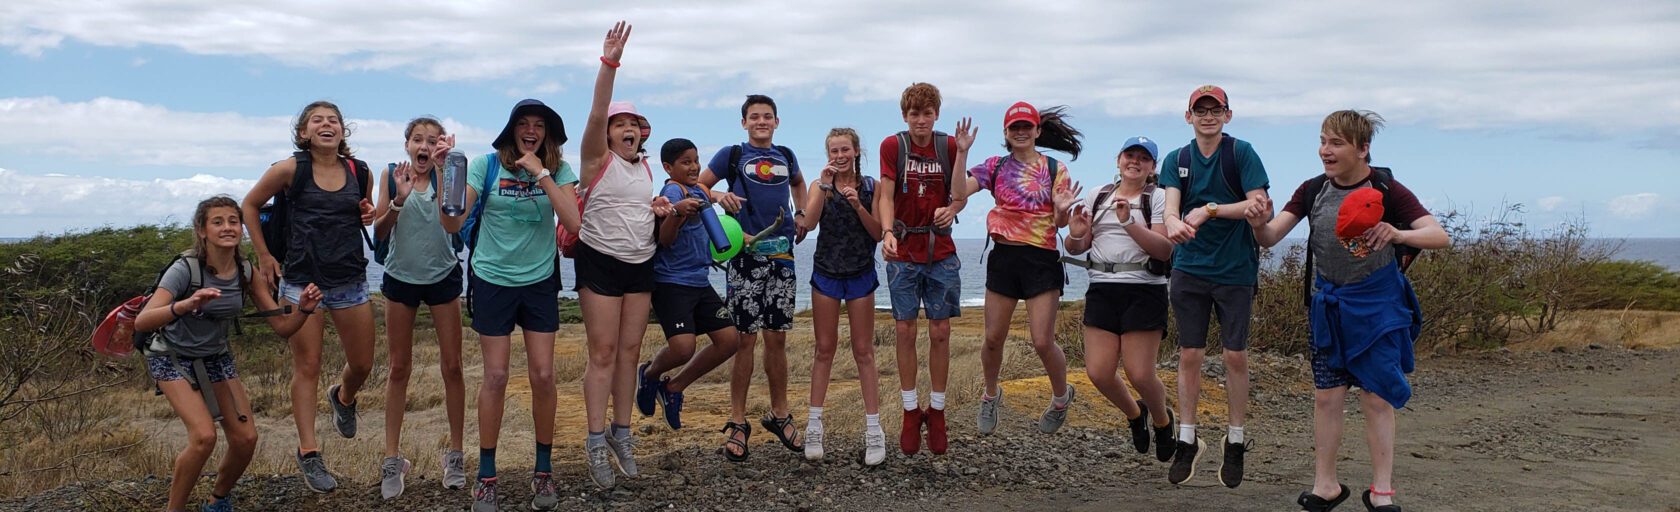 Hawaii Explorer group photo with everyone jumping